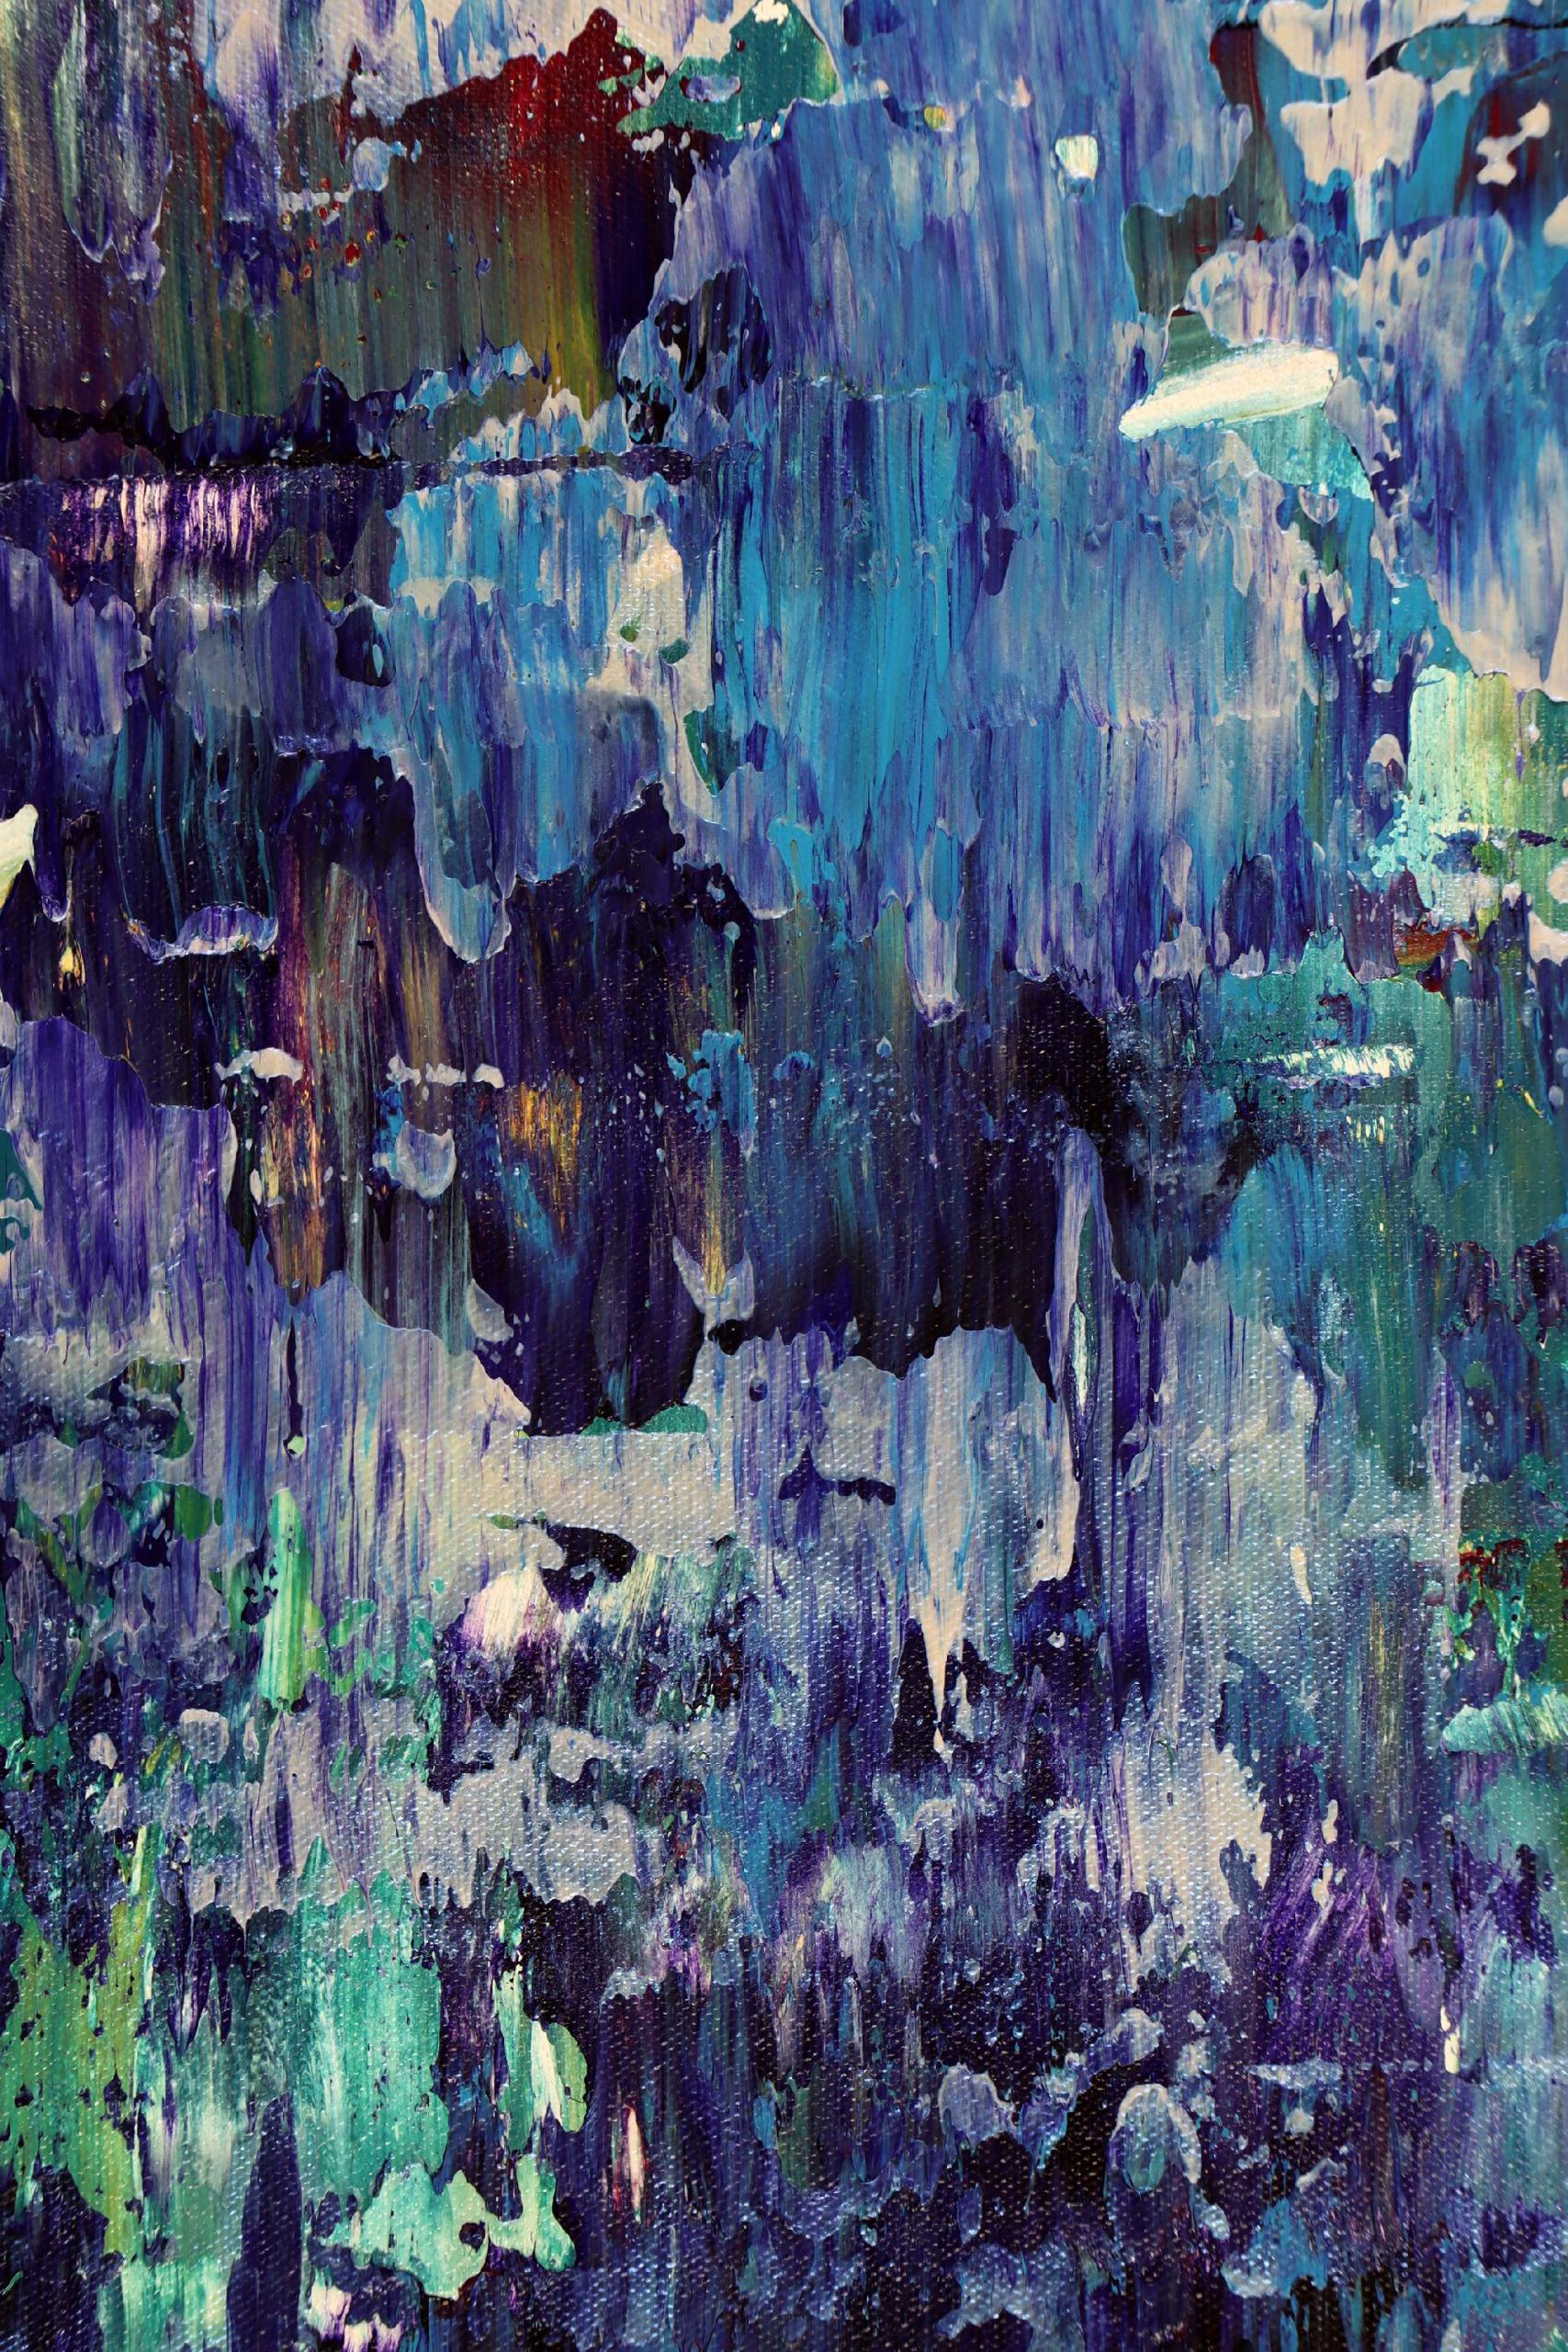 SOLD - Detail / Iridescent Midnight Blue (2021) by Nestor Toro - Los Angeles